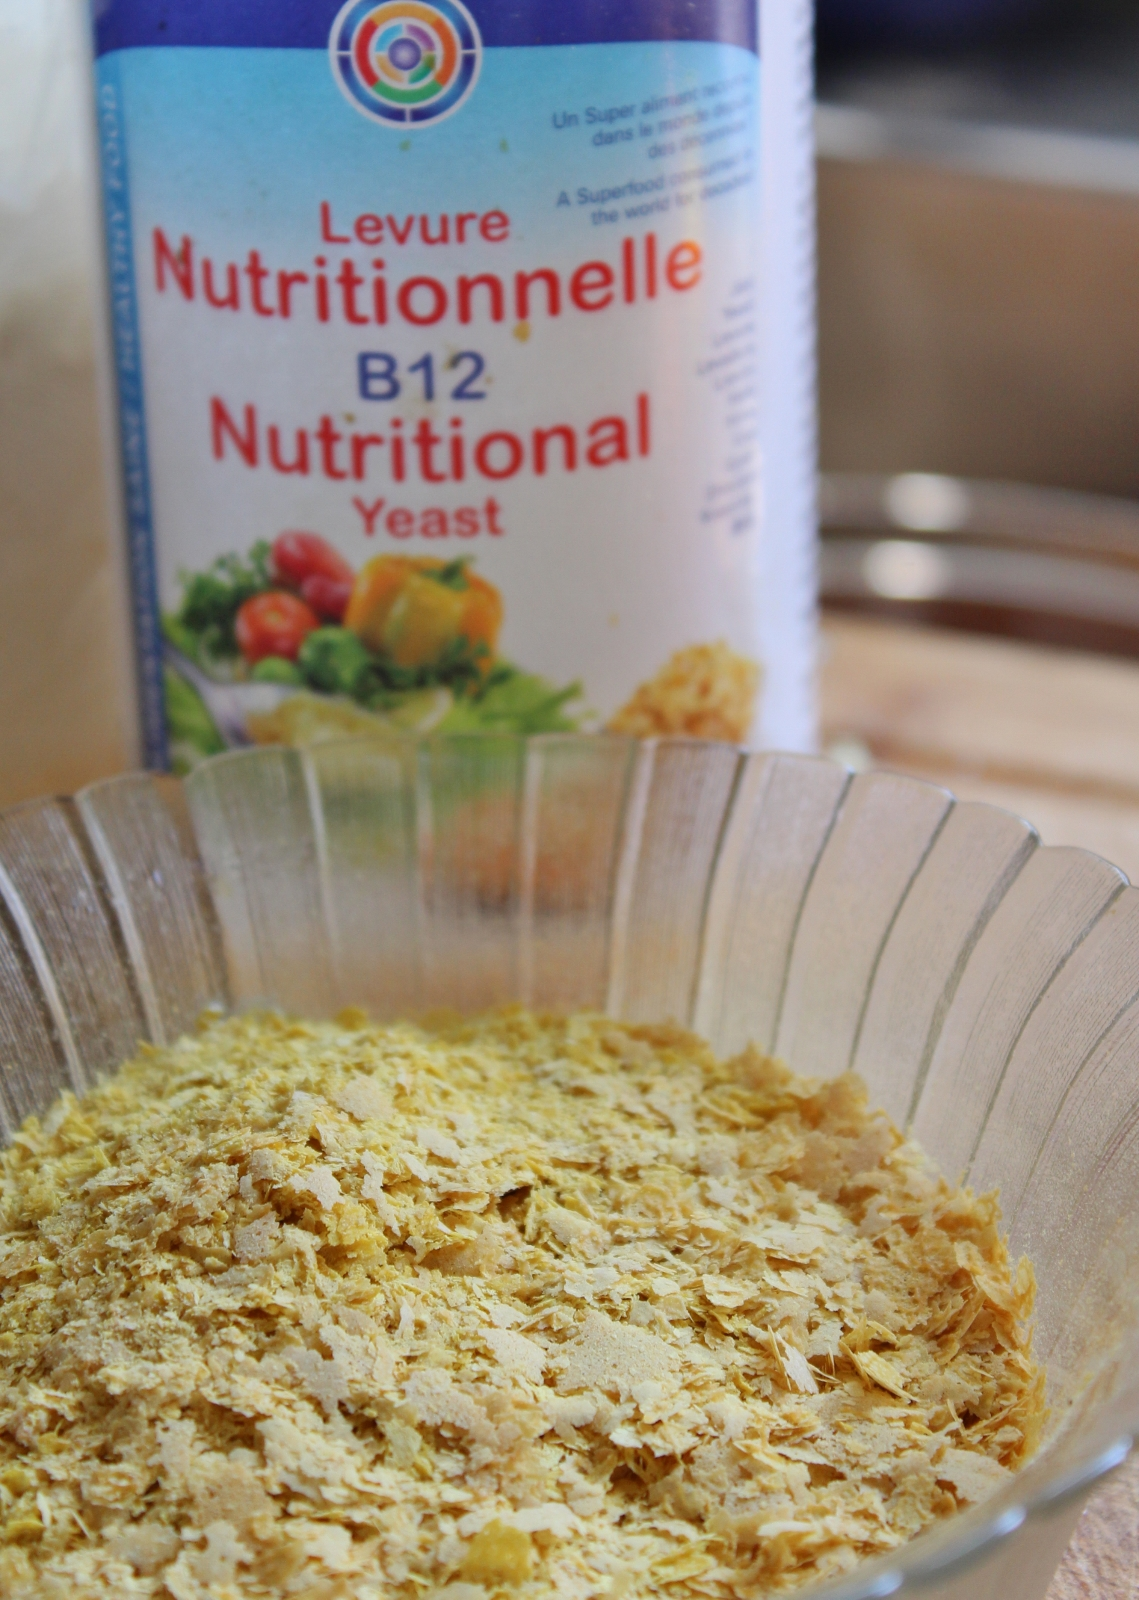 Levure nutritionnelle nutritional yeast vegan (1139x1600)